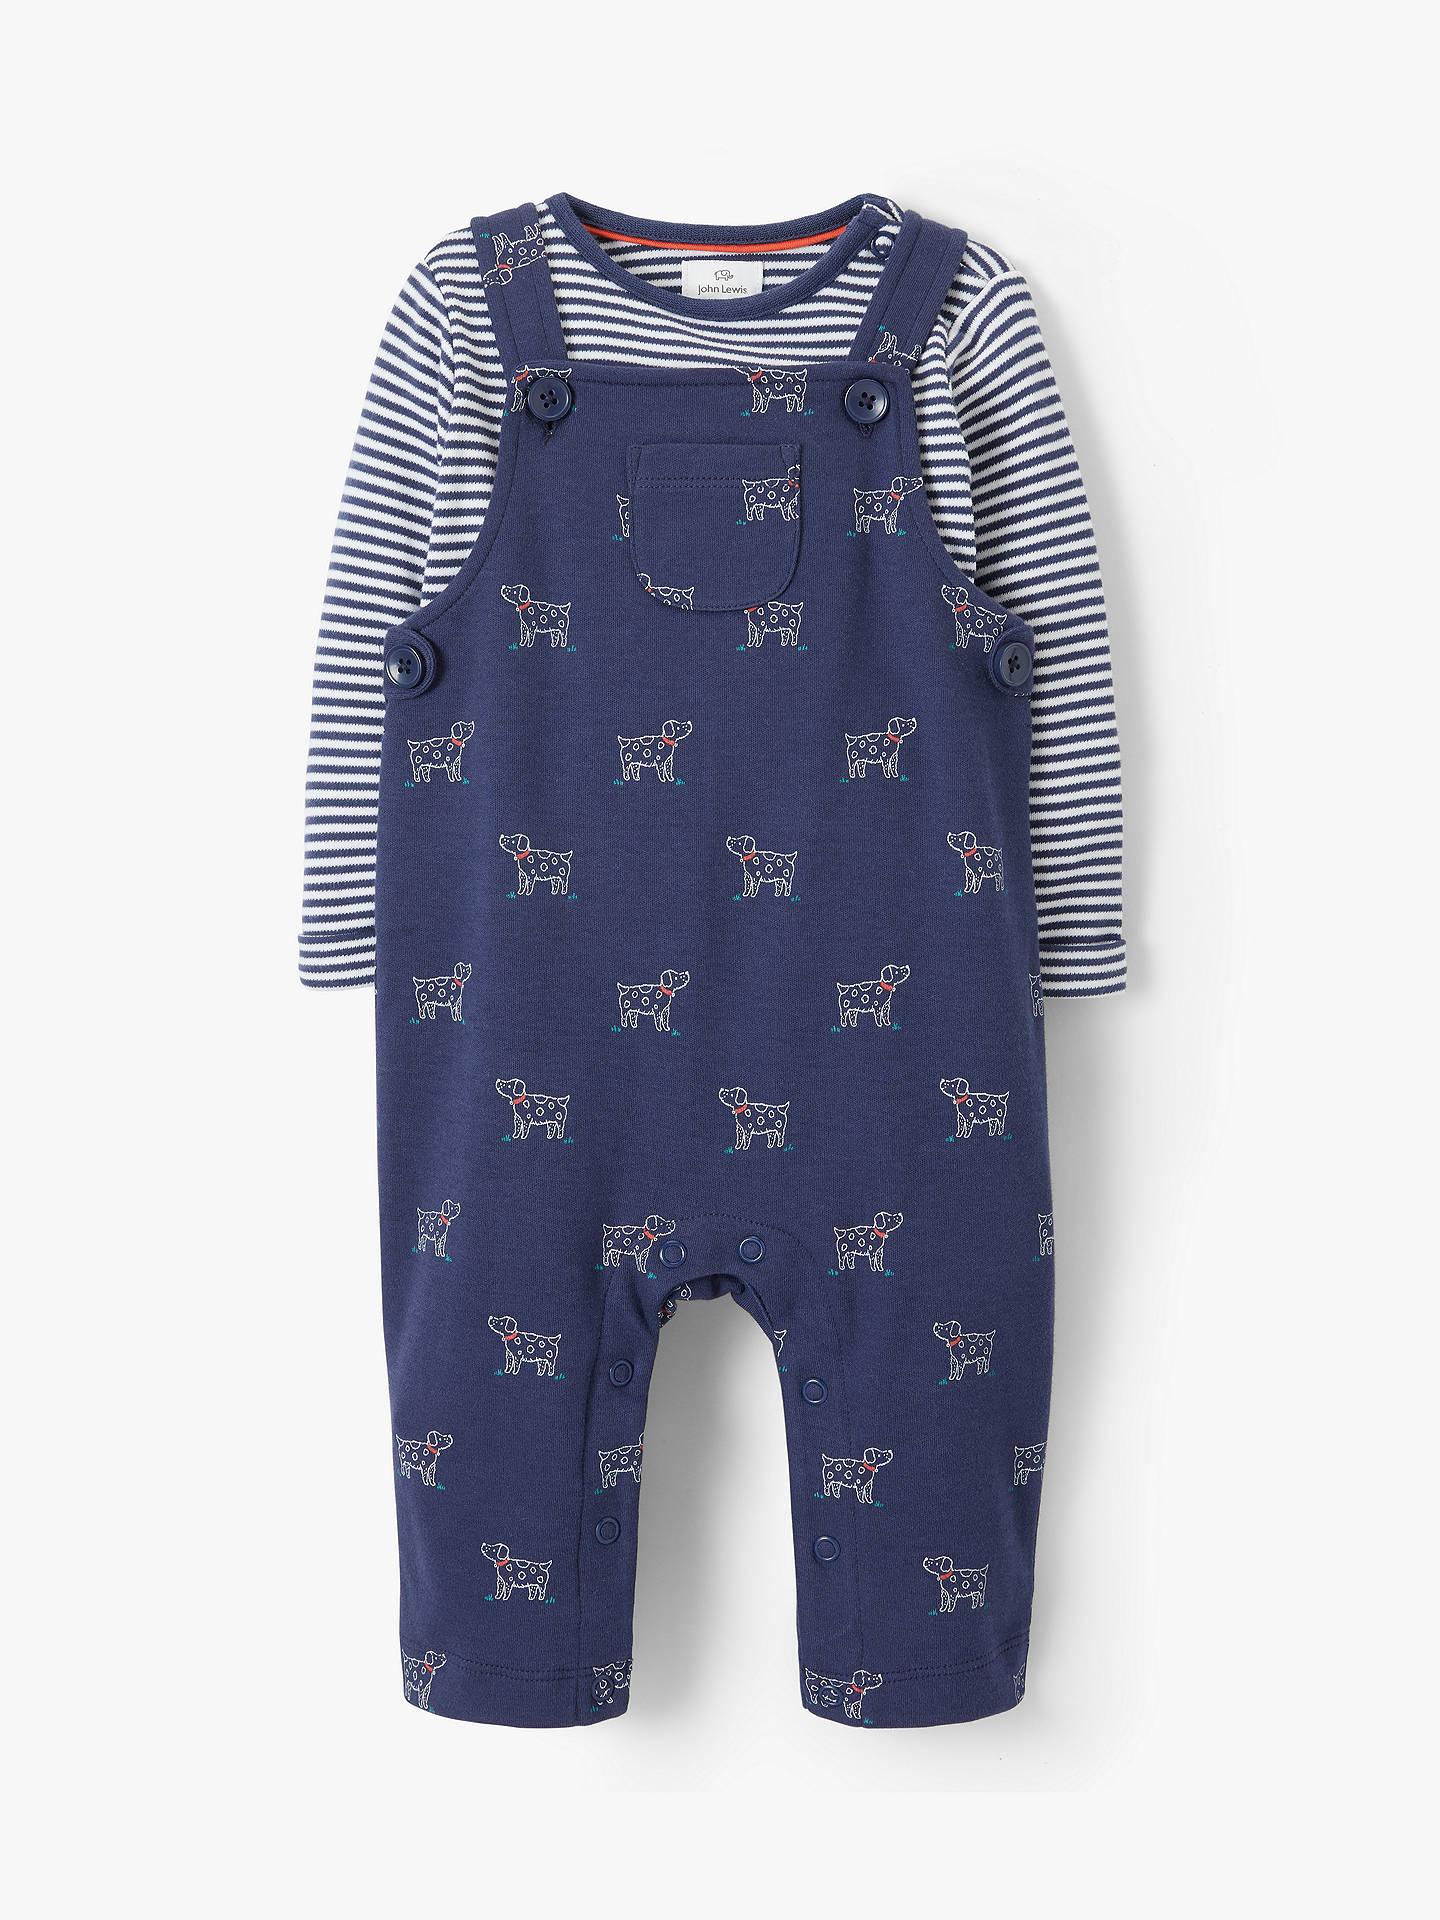 8bfca8f236 Buy John Lewis   Partners Baby Dog Print Dungaree Set